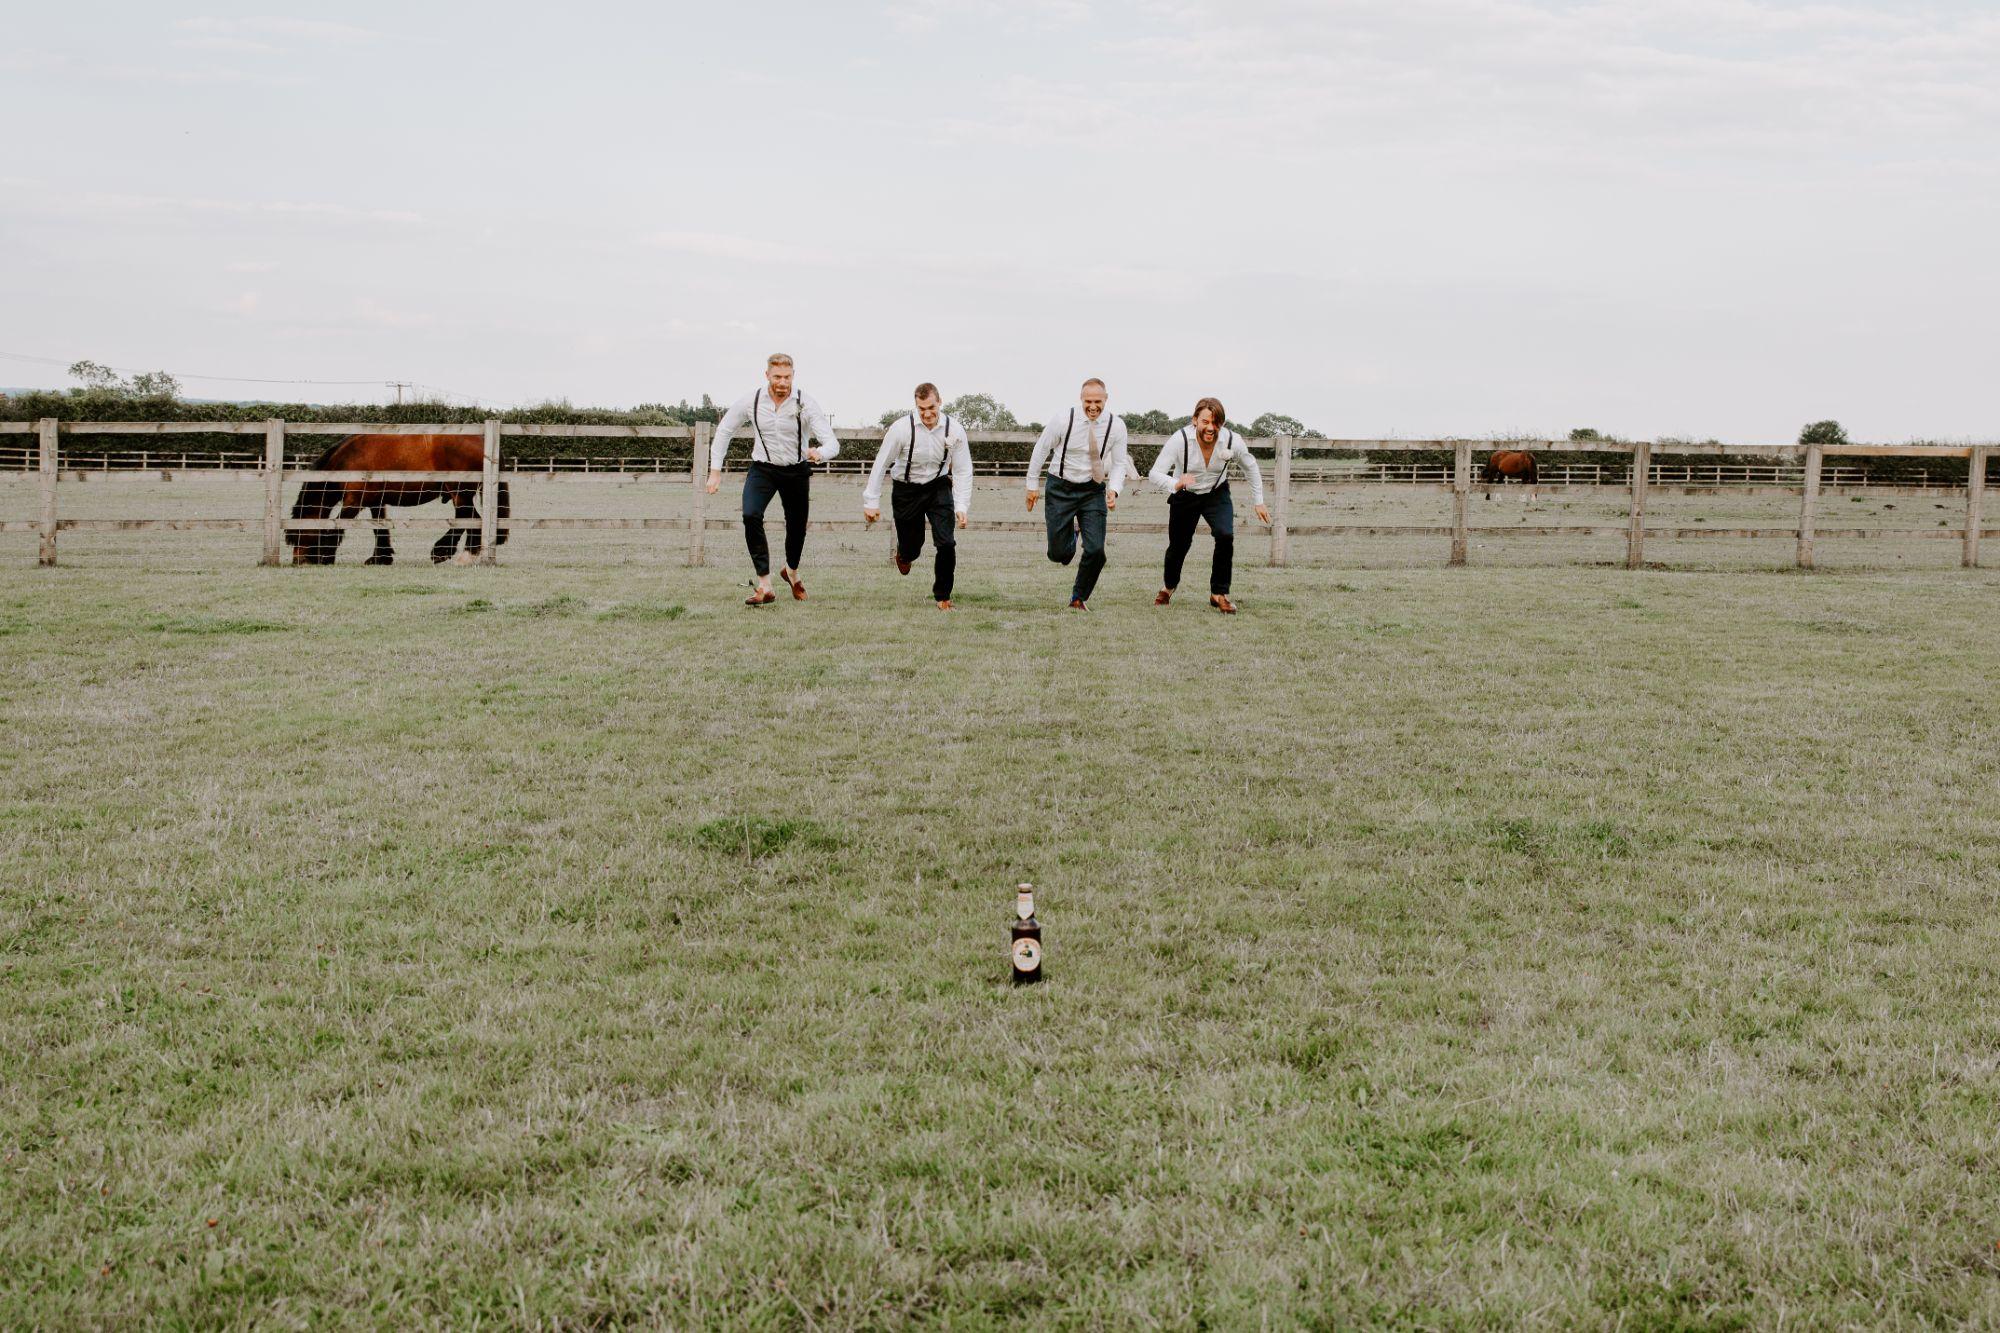 Wedding_Photography_Becky_Tranter-9.jpg